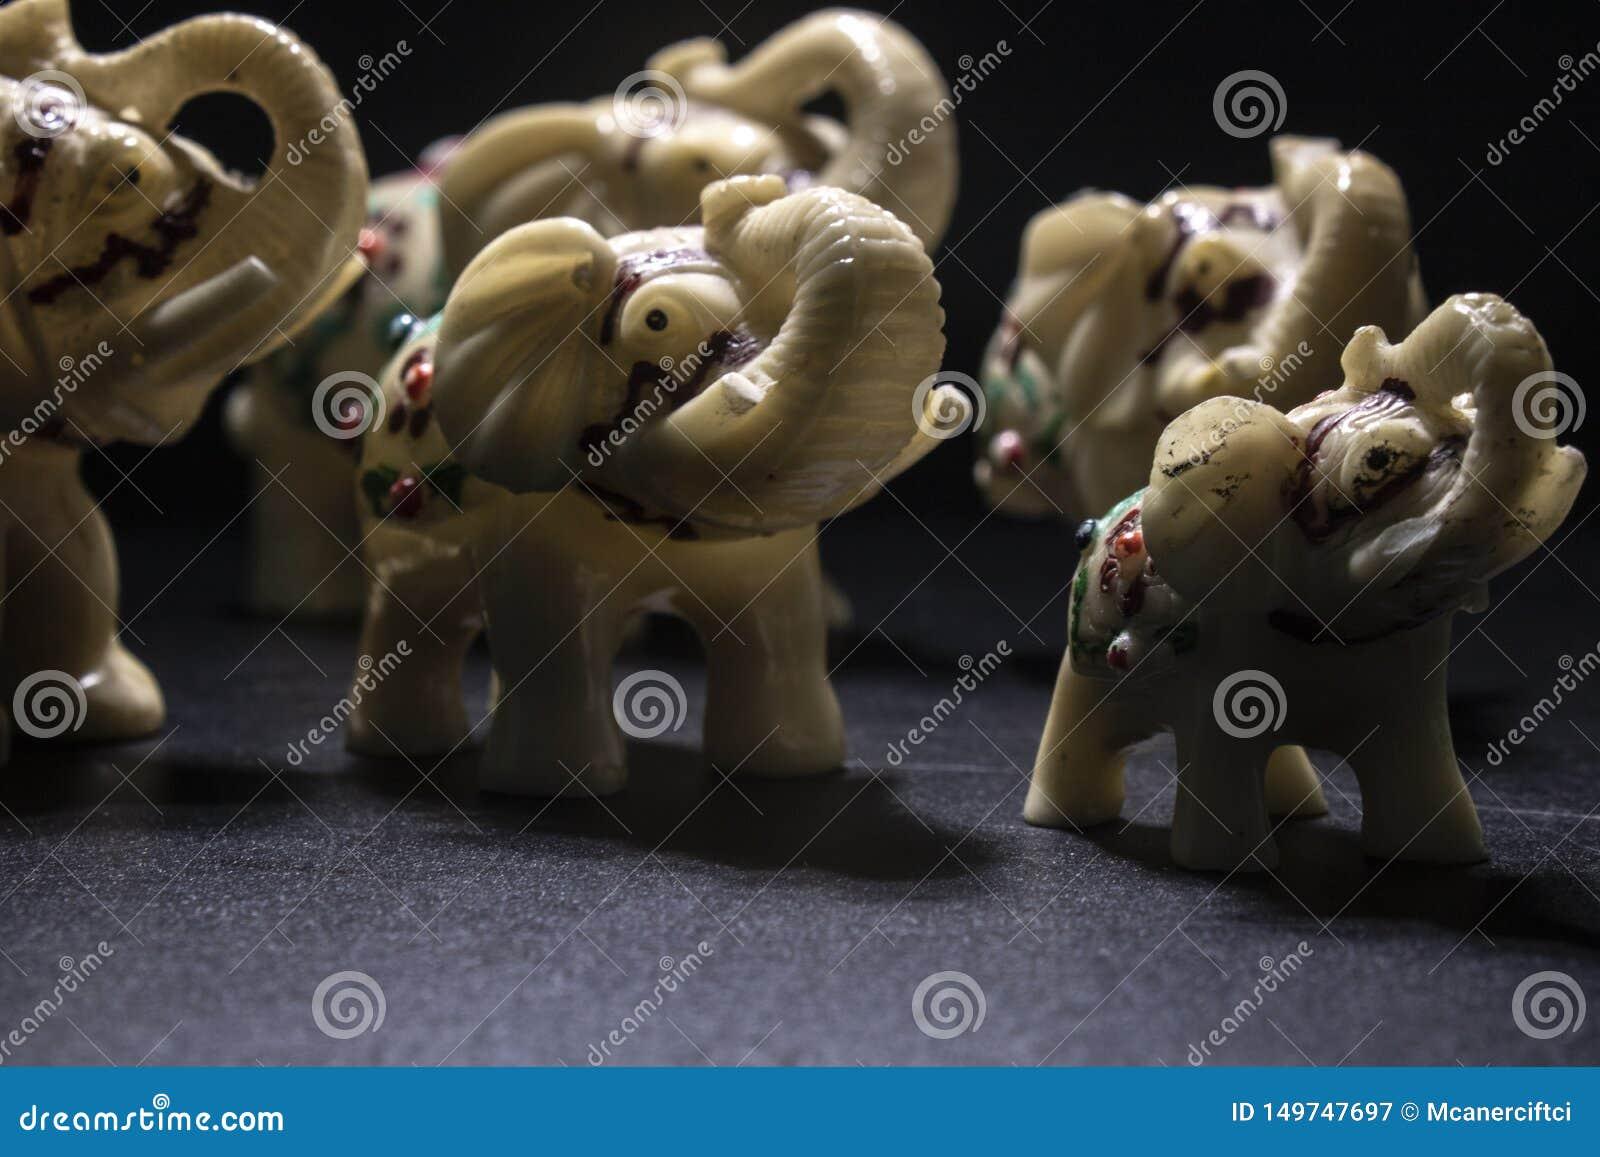 Flock av vit-mönstrade elefanter skjuten sida Svart bakgrund